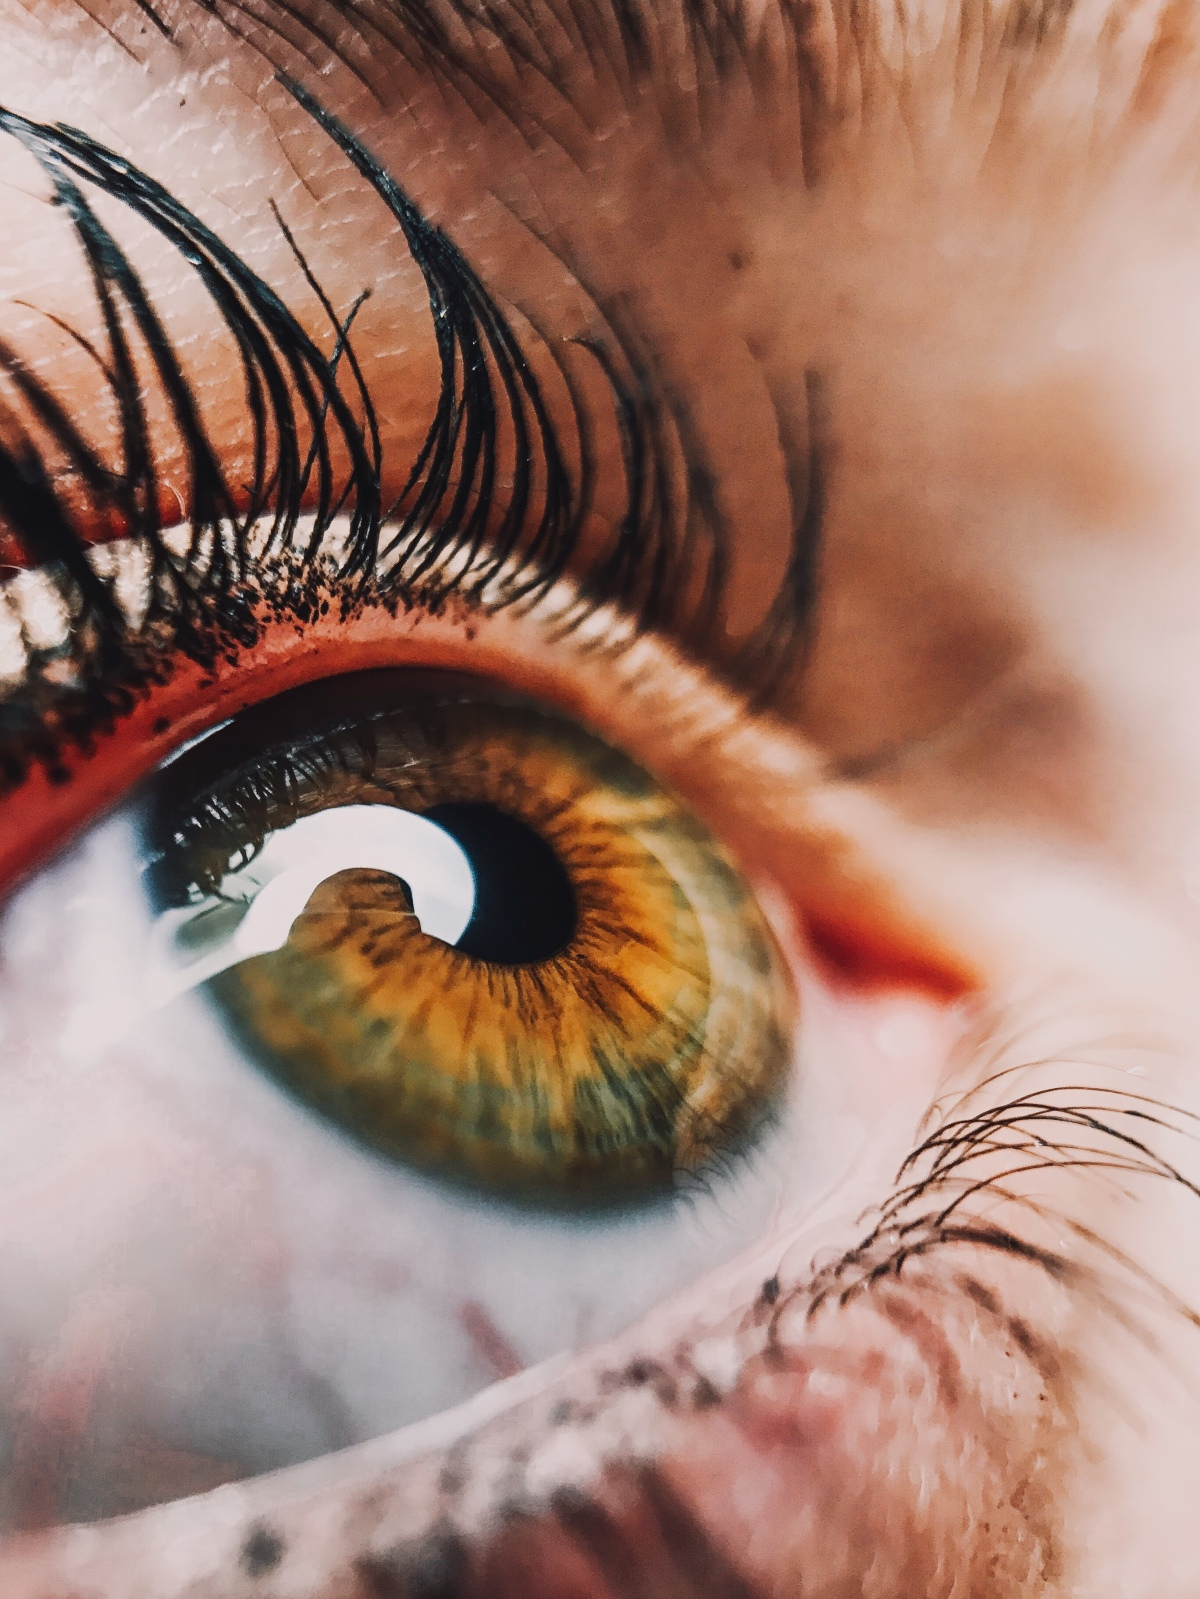 Eye more the spiritual andeternal